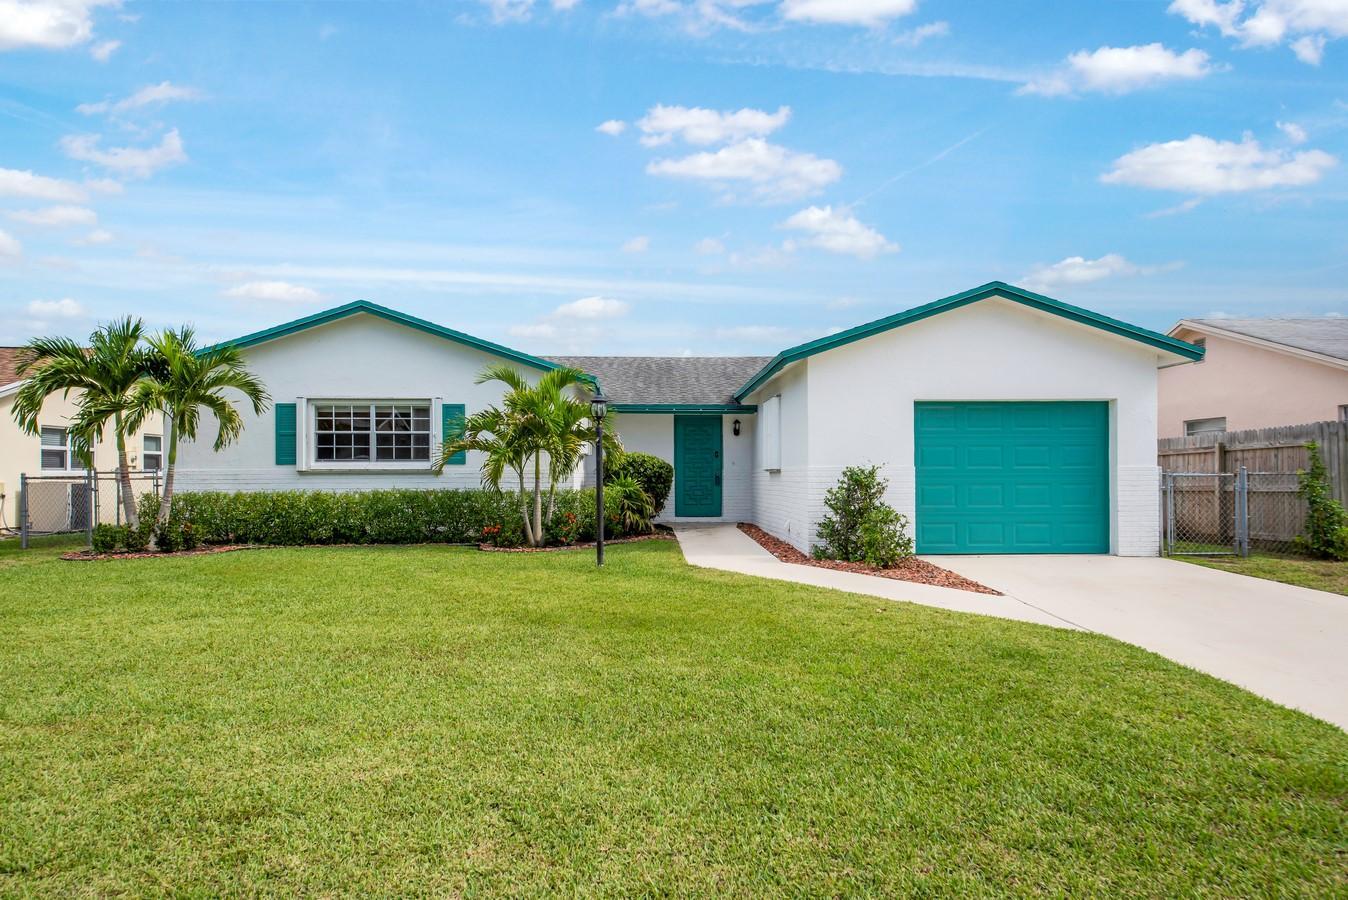 Home for sale in Sandalfoot Cove Boca Raton Florida